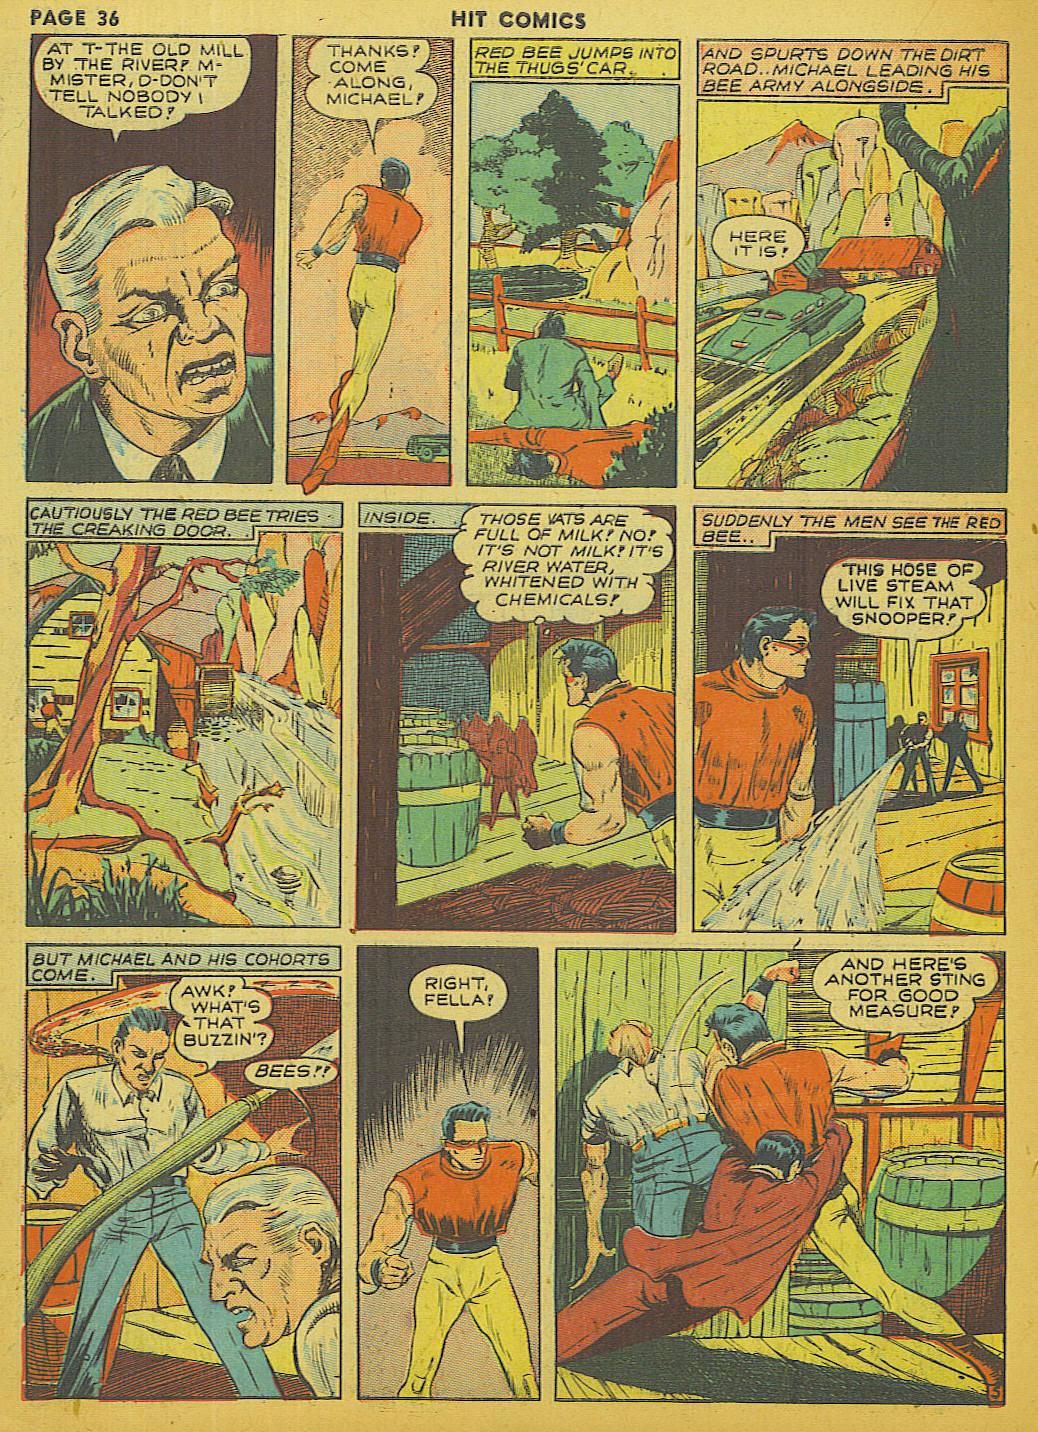 Read online Hit Comics comic -  Issue #13 - 38